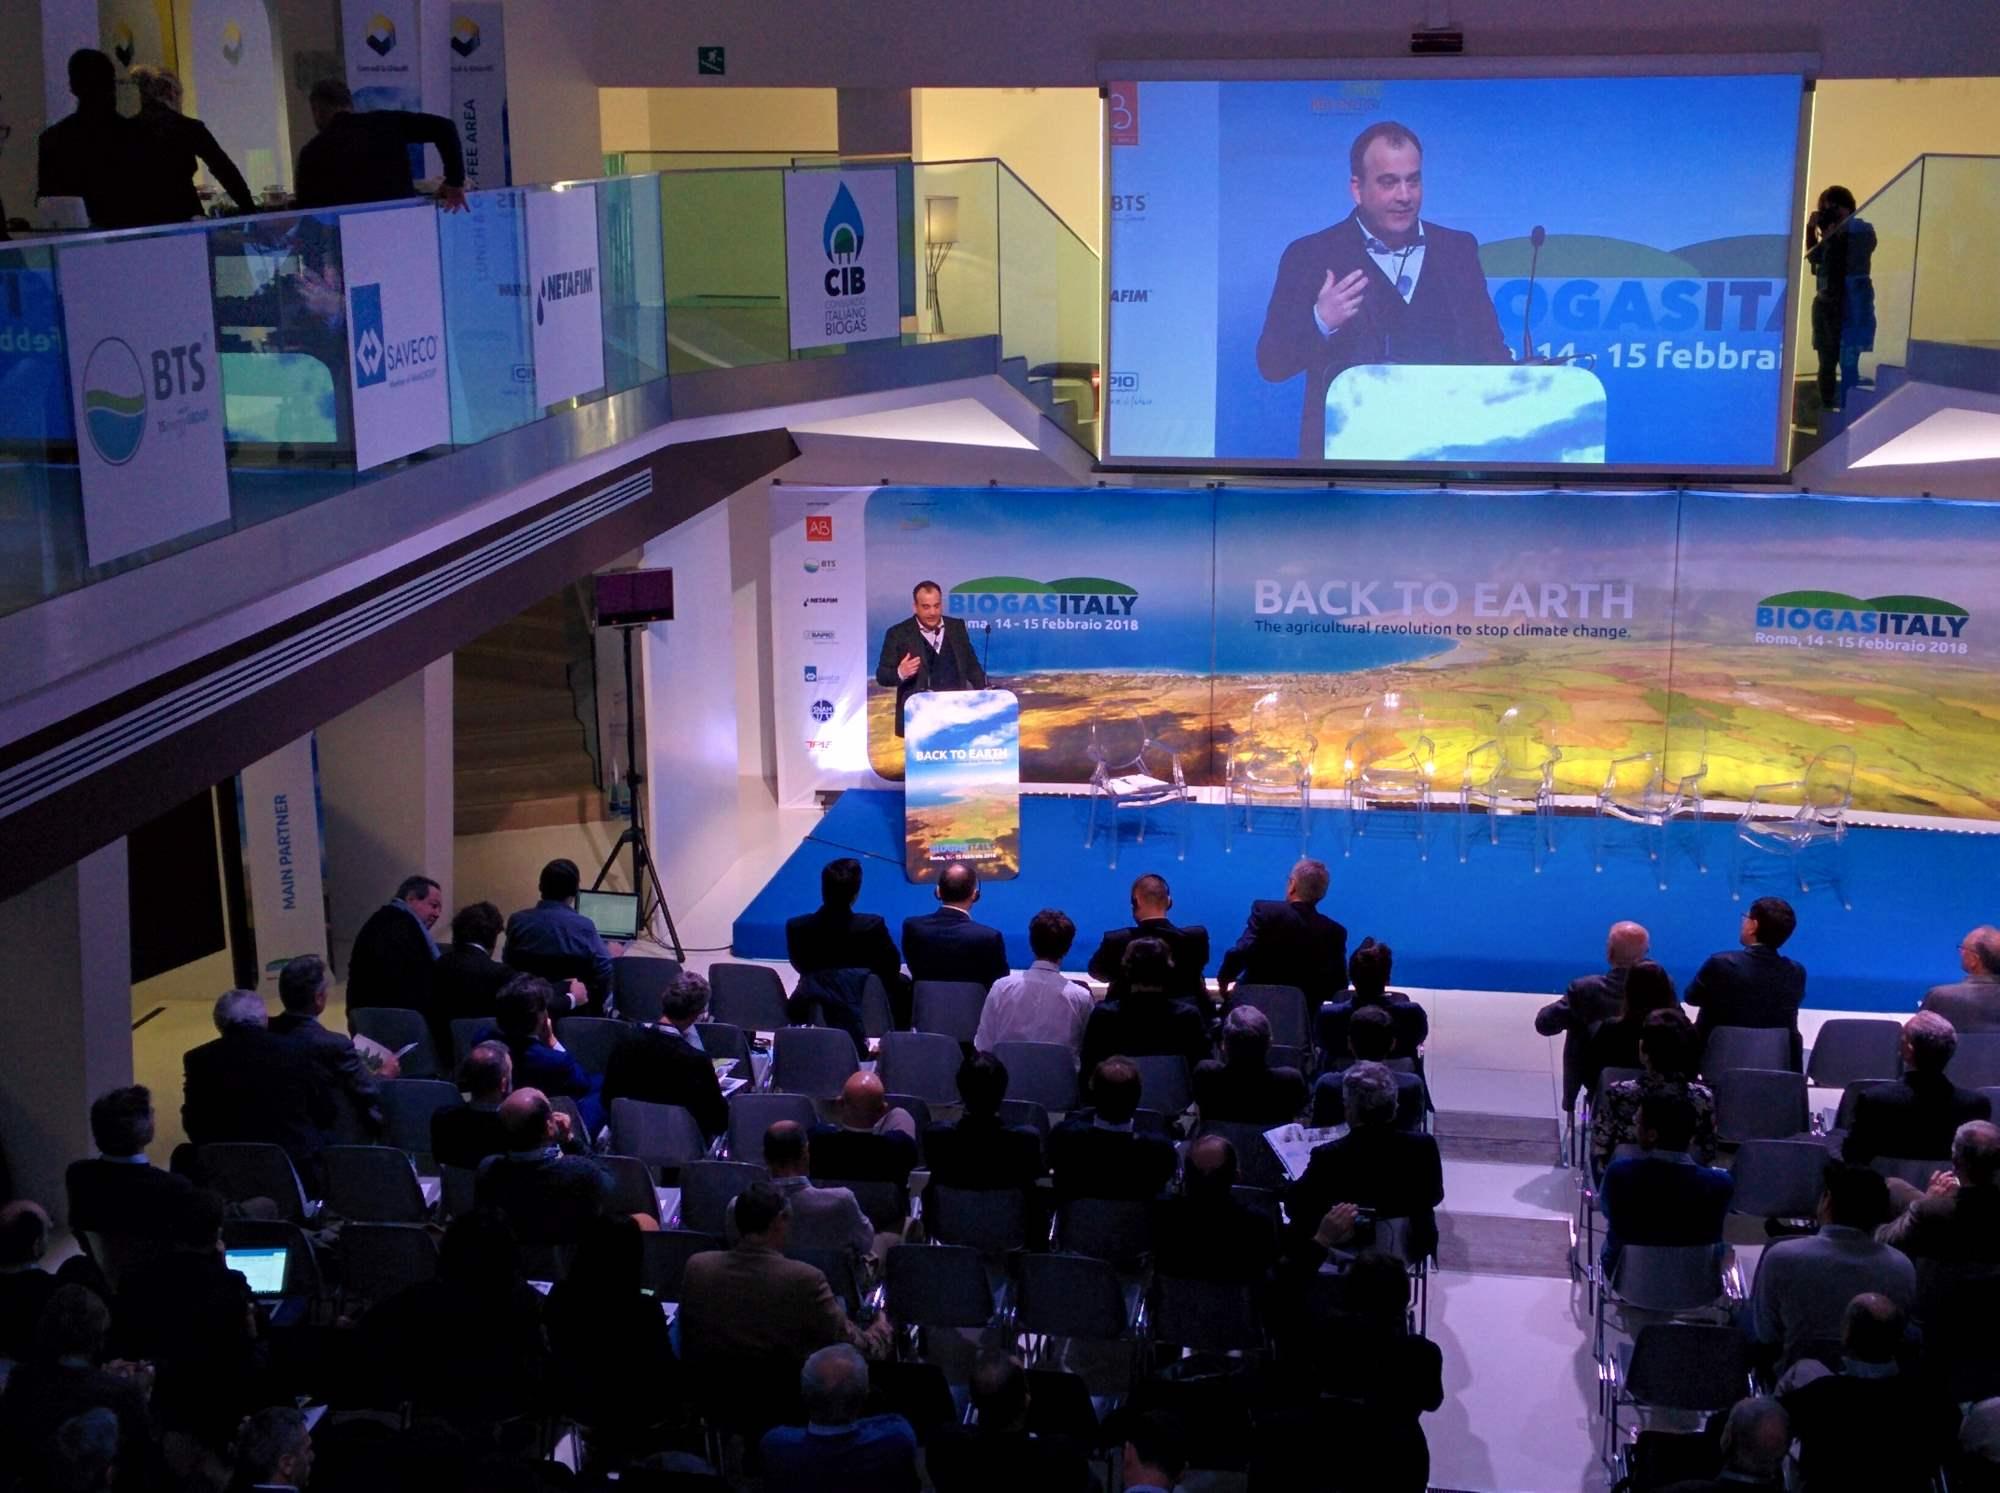 Biogas Italy 2018